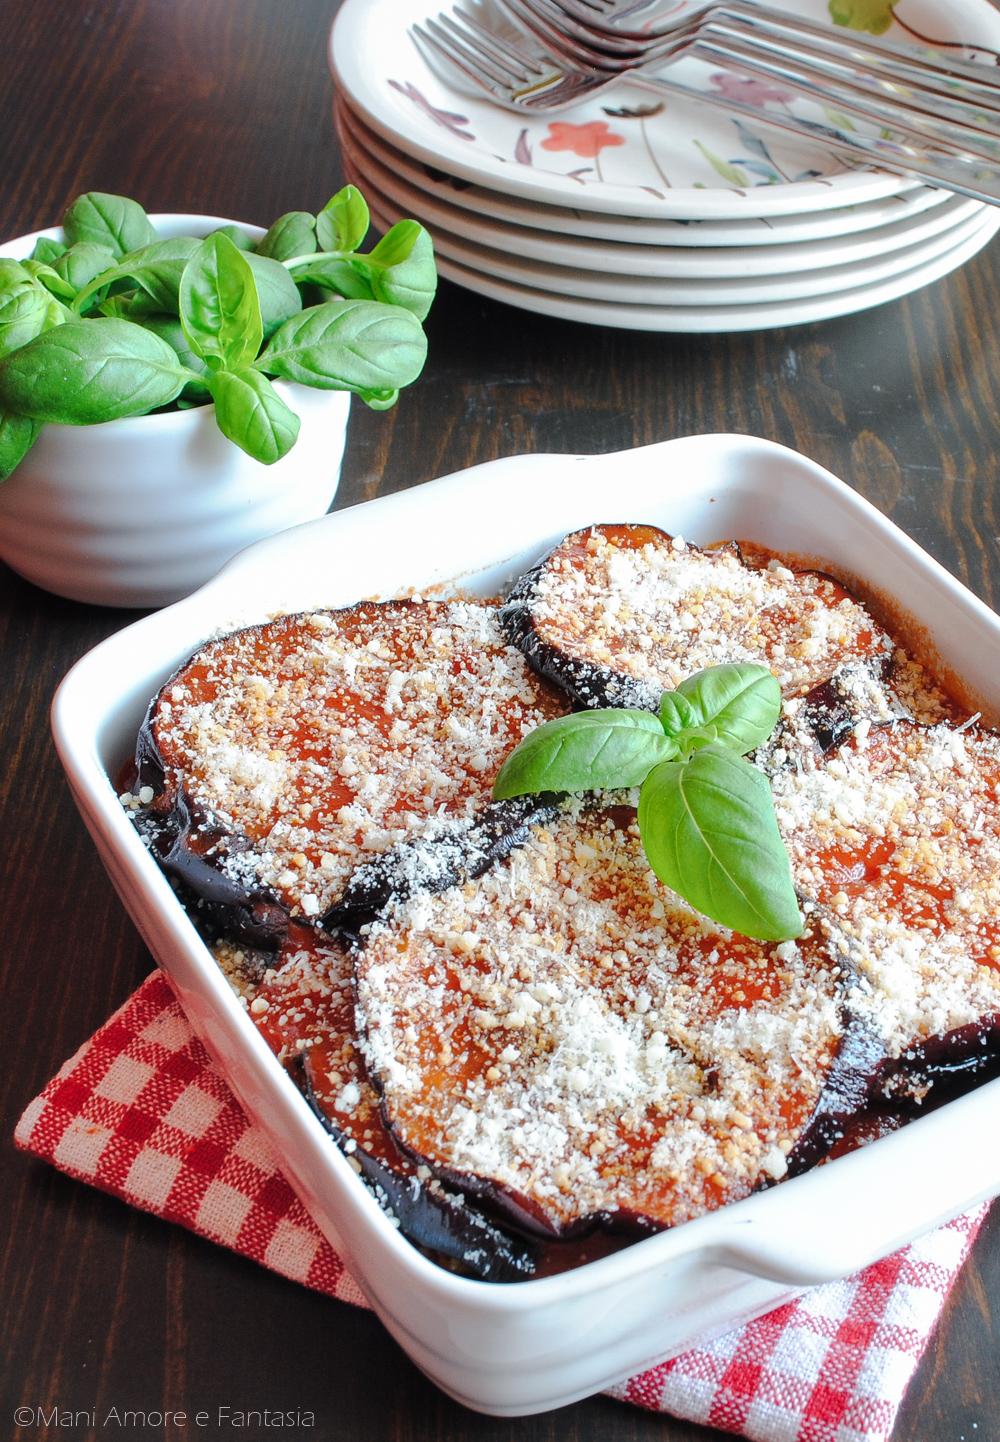 Parmigiana Siciliana Di Melanzane Secondo Piatto Rustico Senza Forno